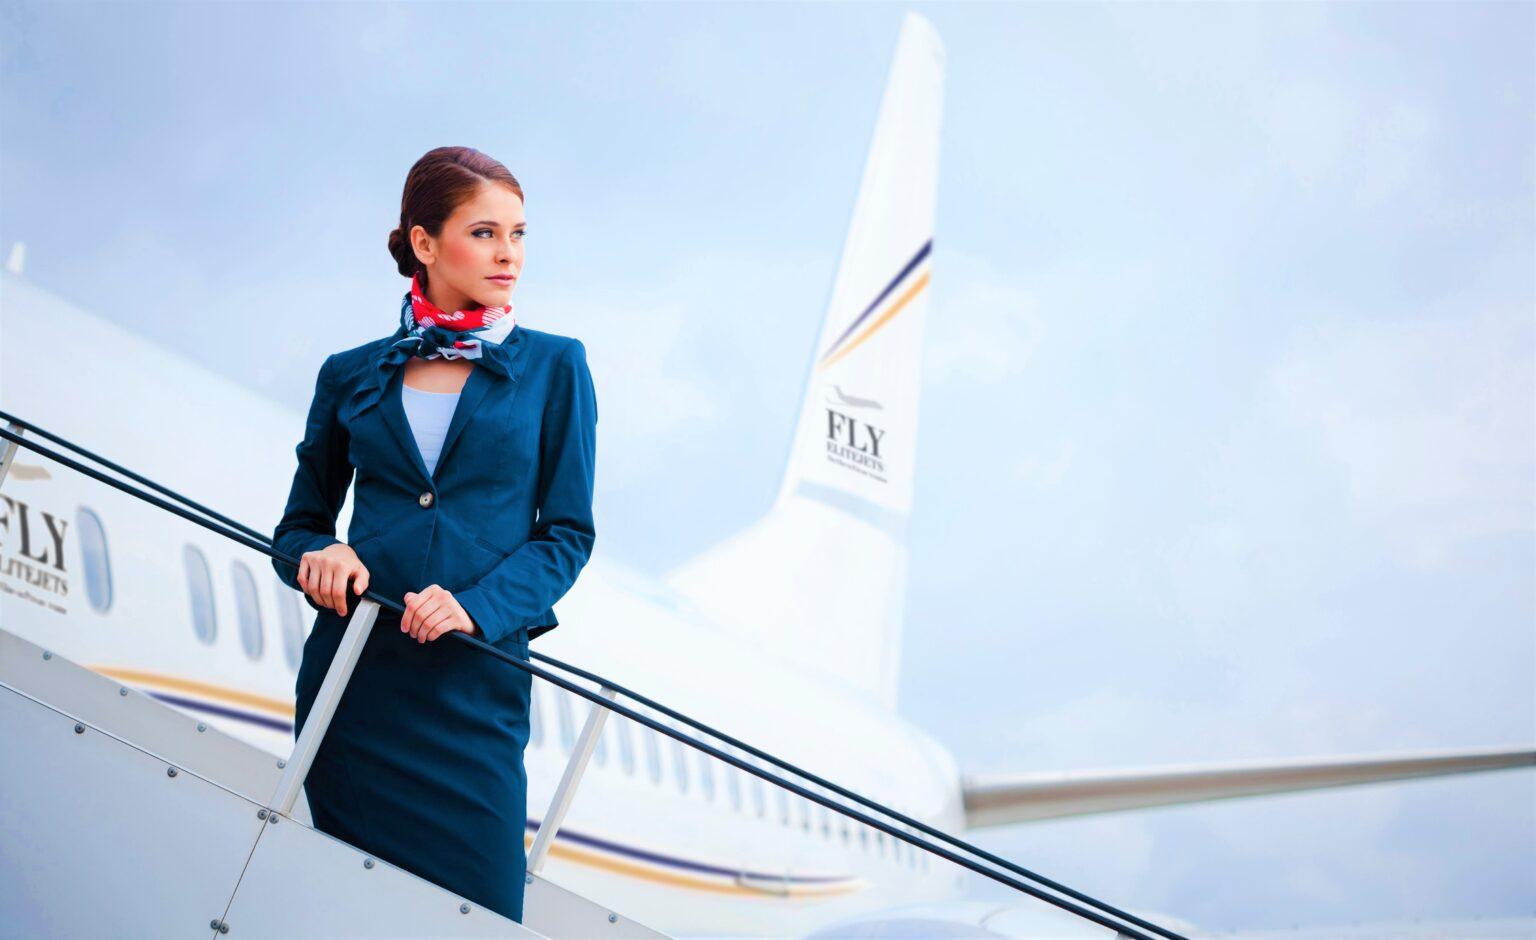 Beautiful air stewardess